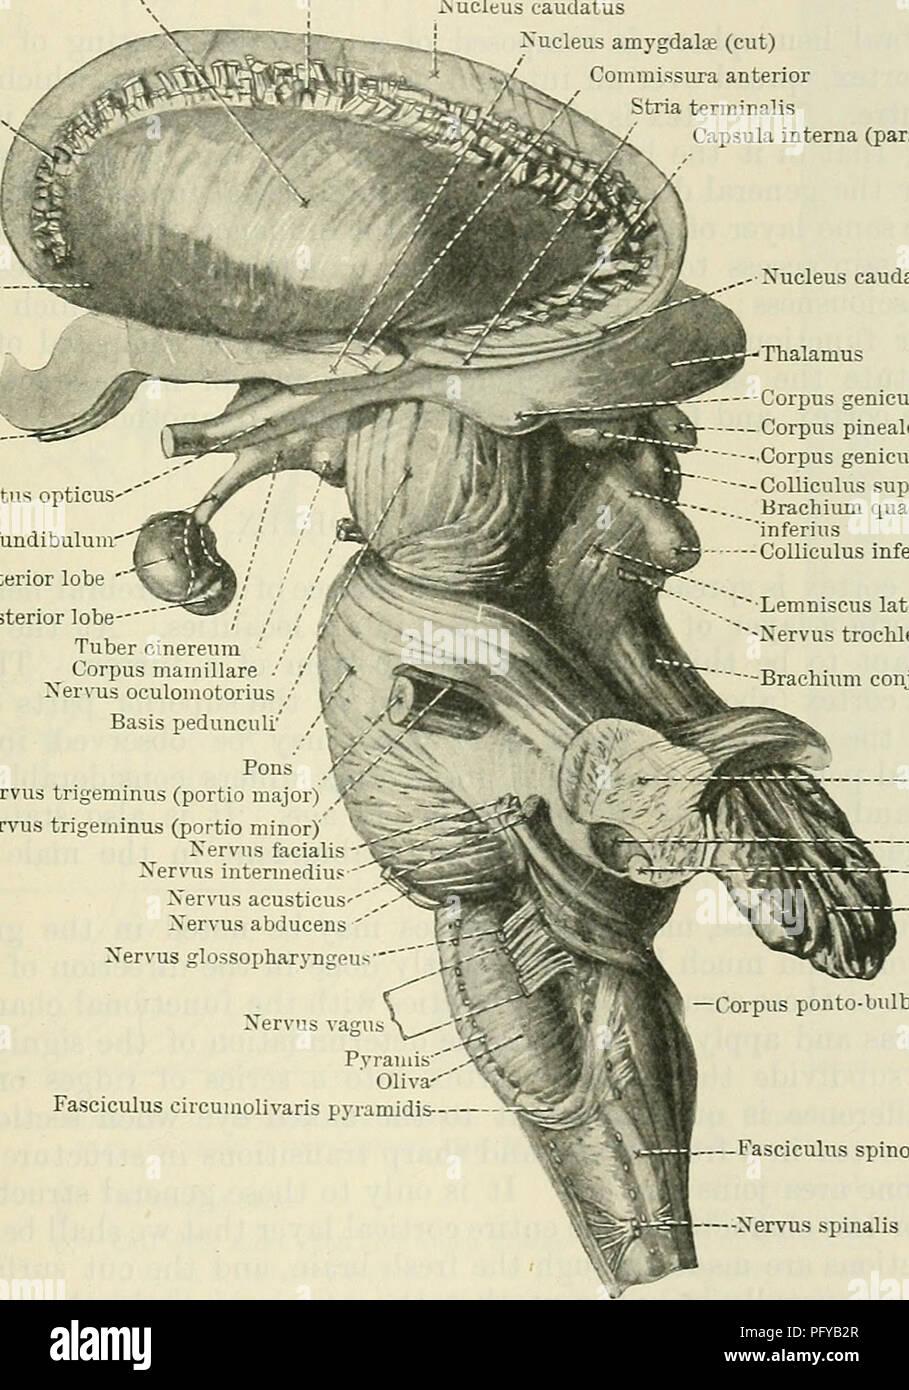 Cunninghams Text Book Of Anatomy Anatomy Basal Ganglia Of The